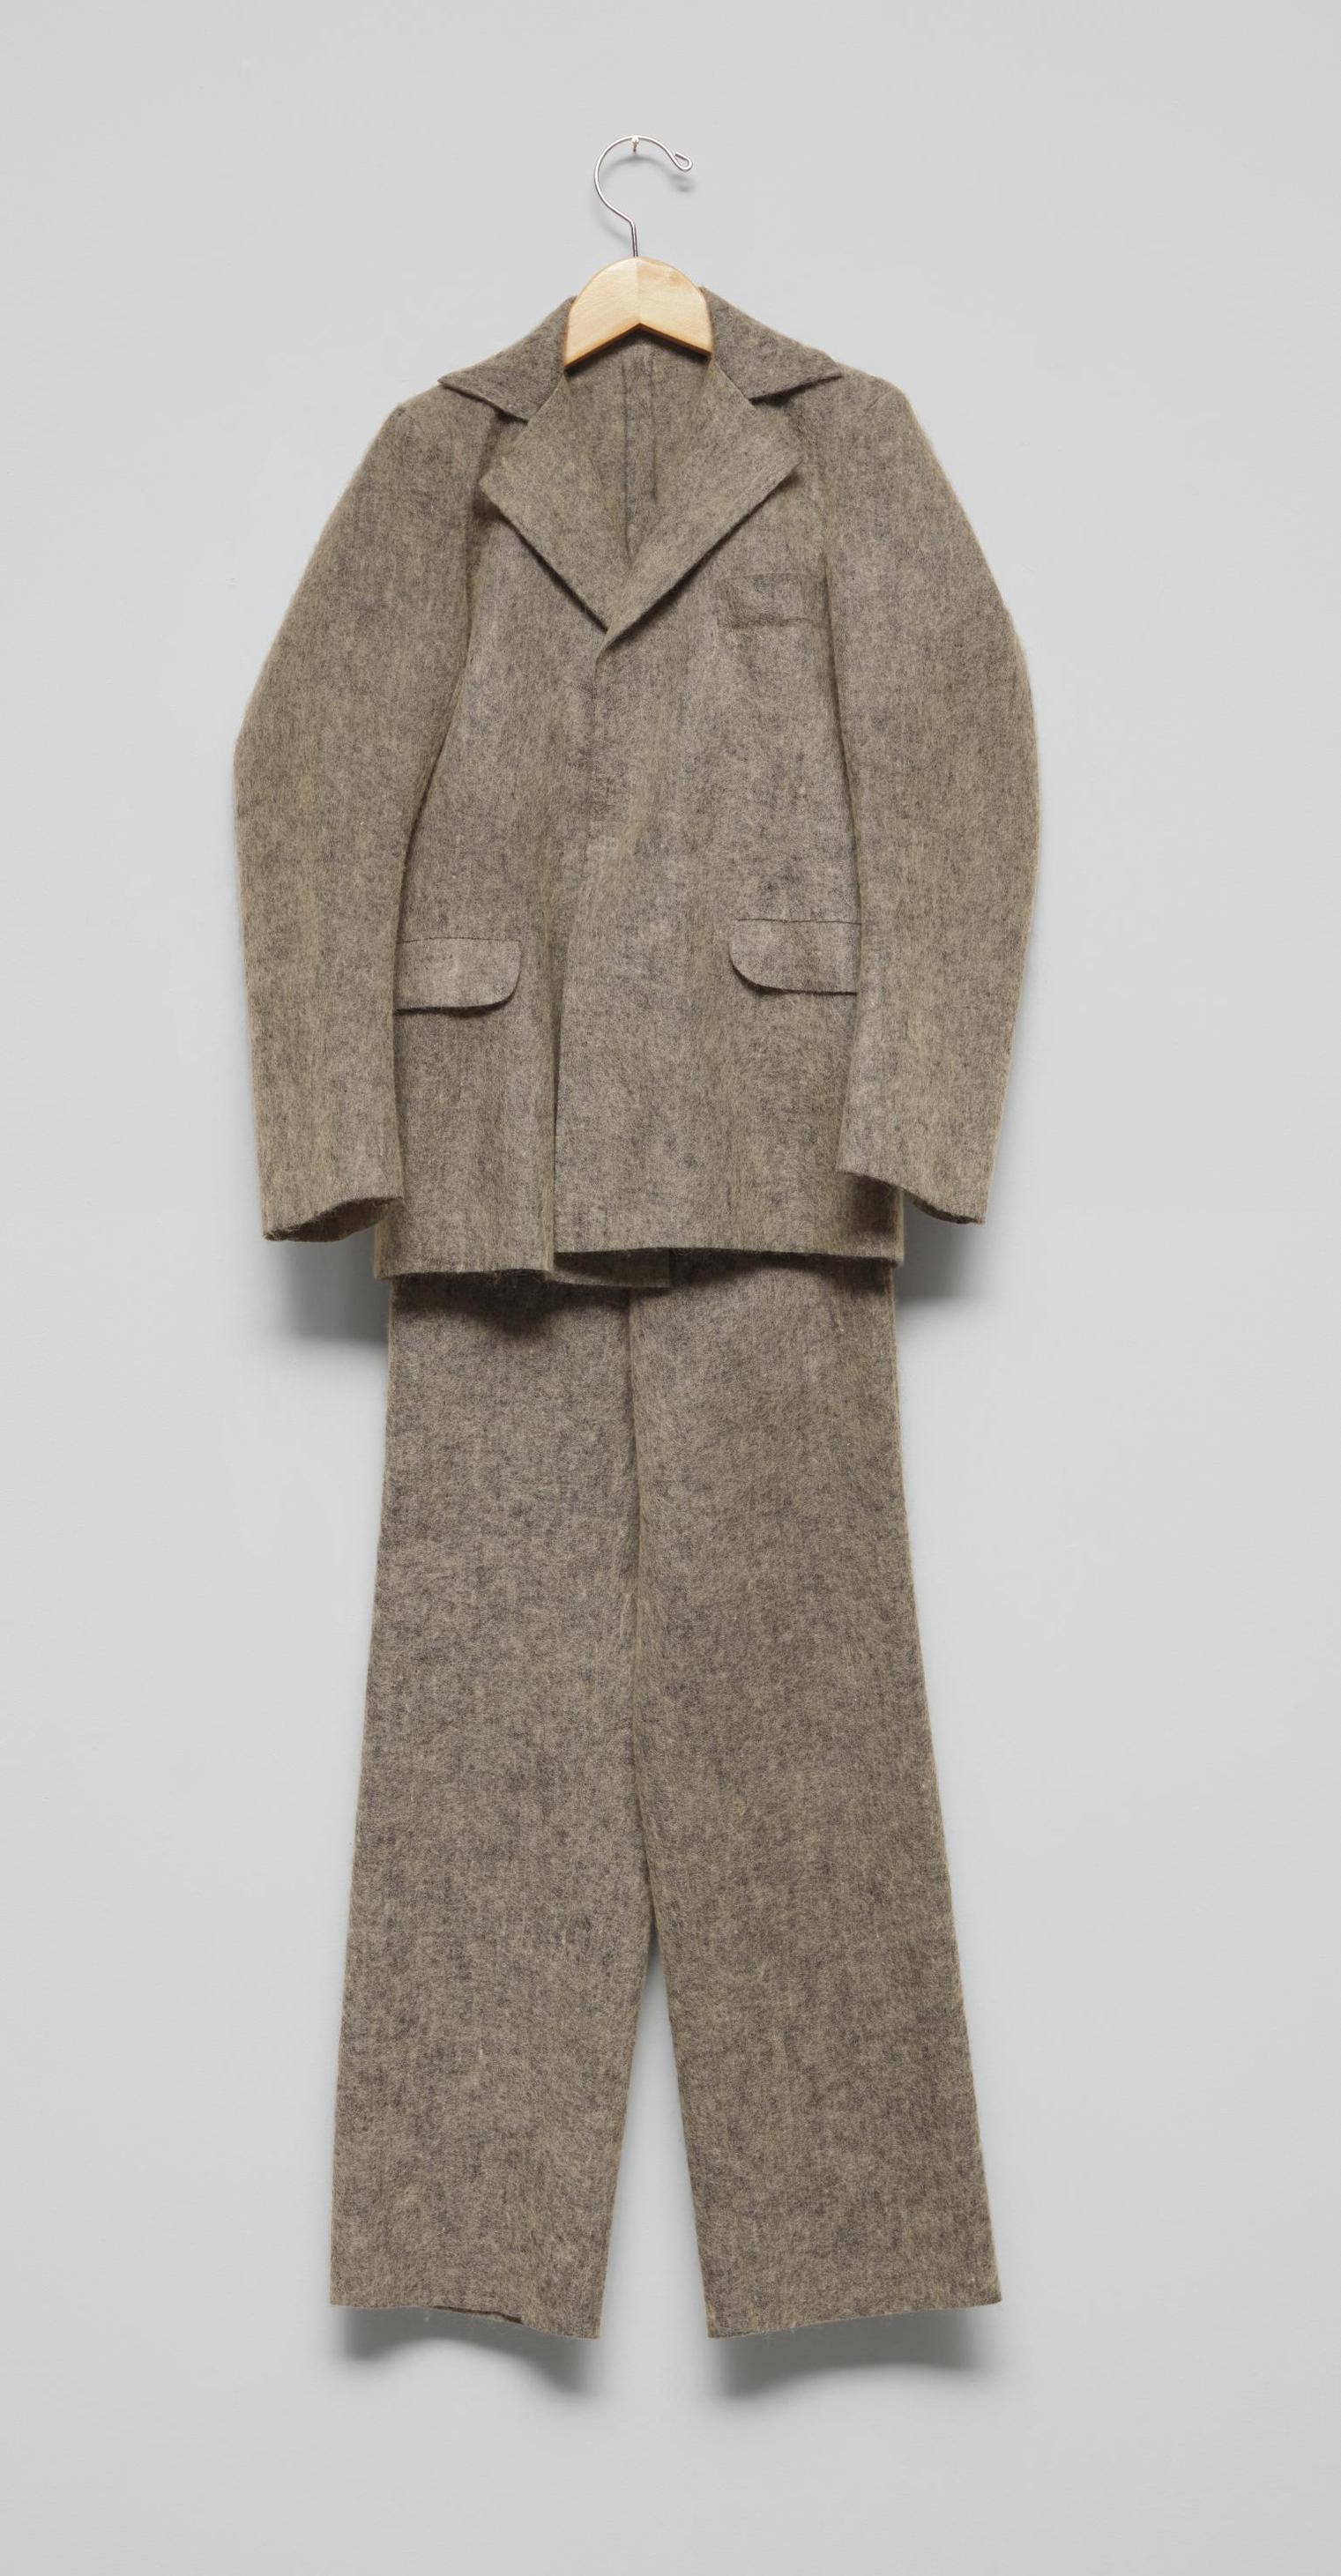 Maurizio Cattelan-Untitled (Joseph Beuys Suit)-2000